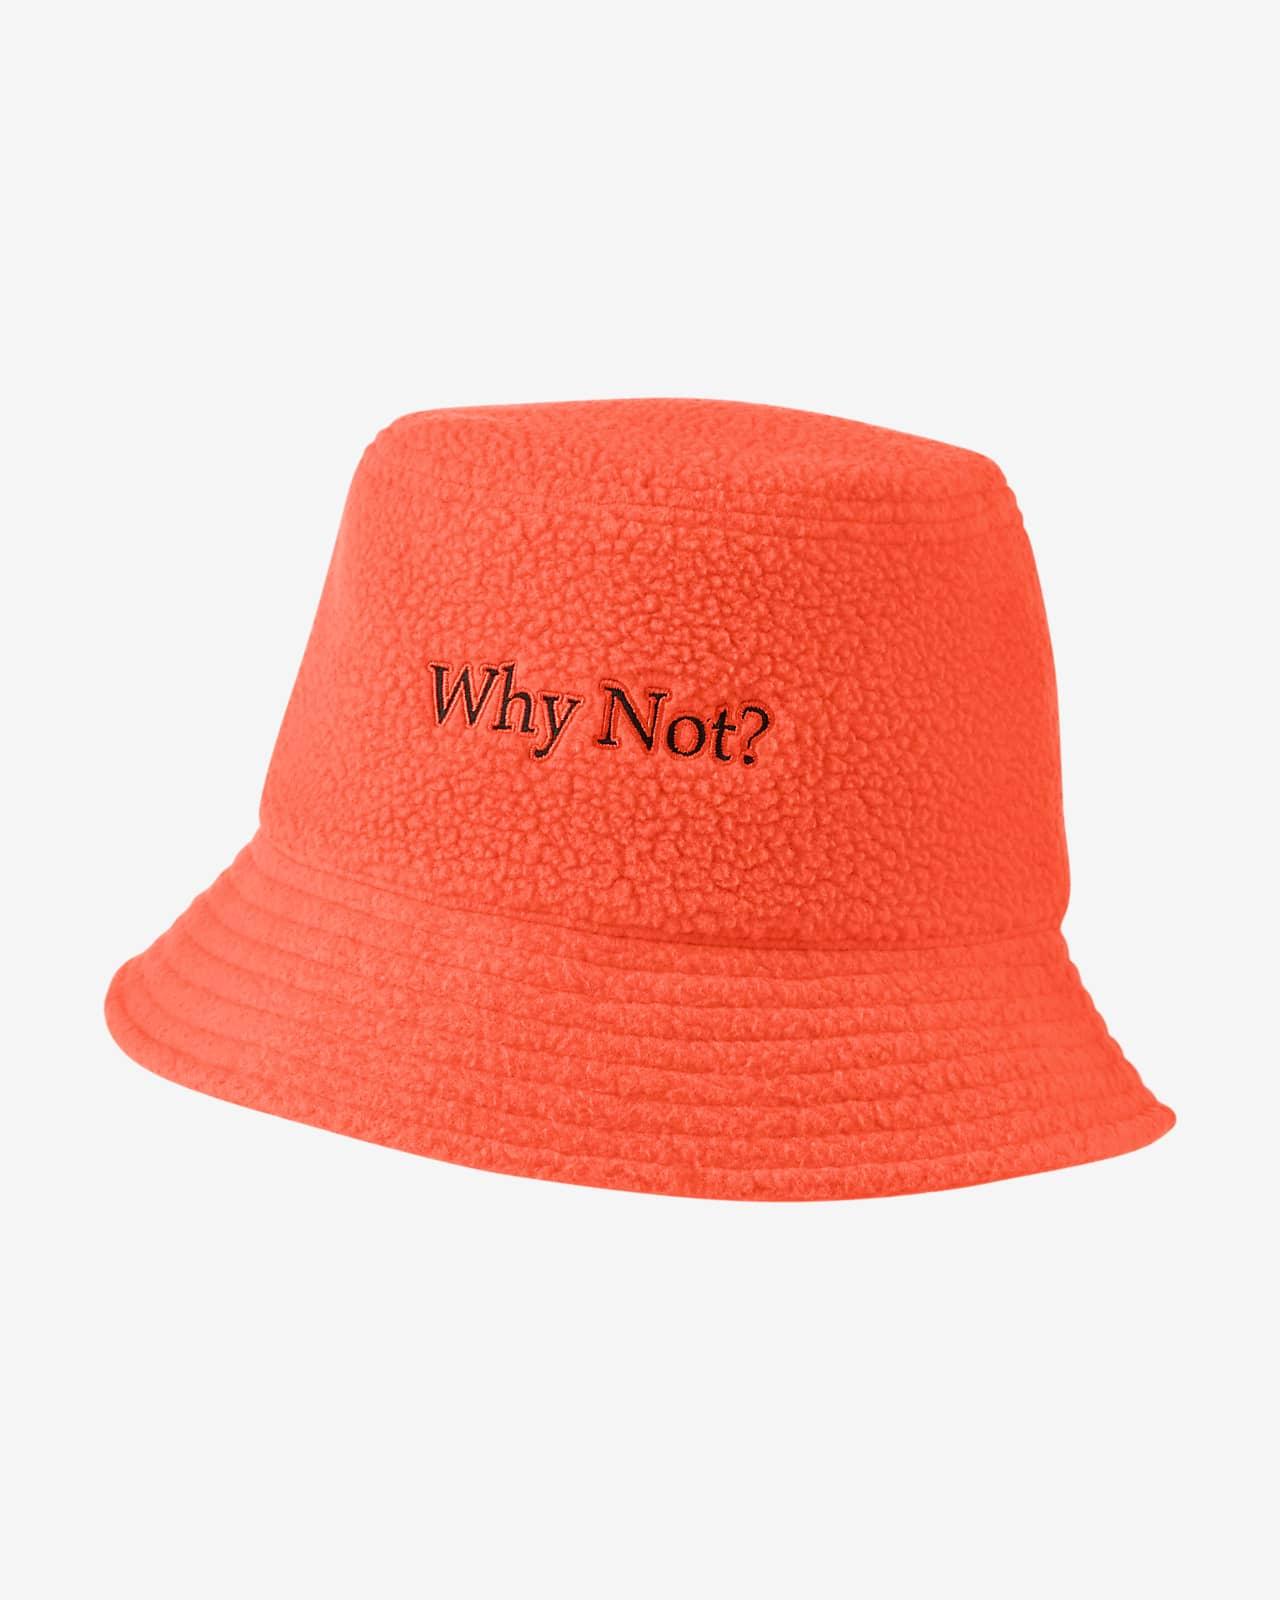 Jordan 'Why Not?' Bucket Cap